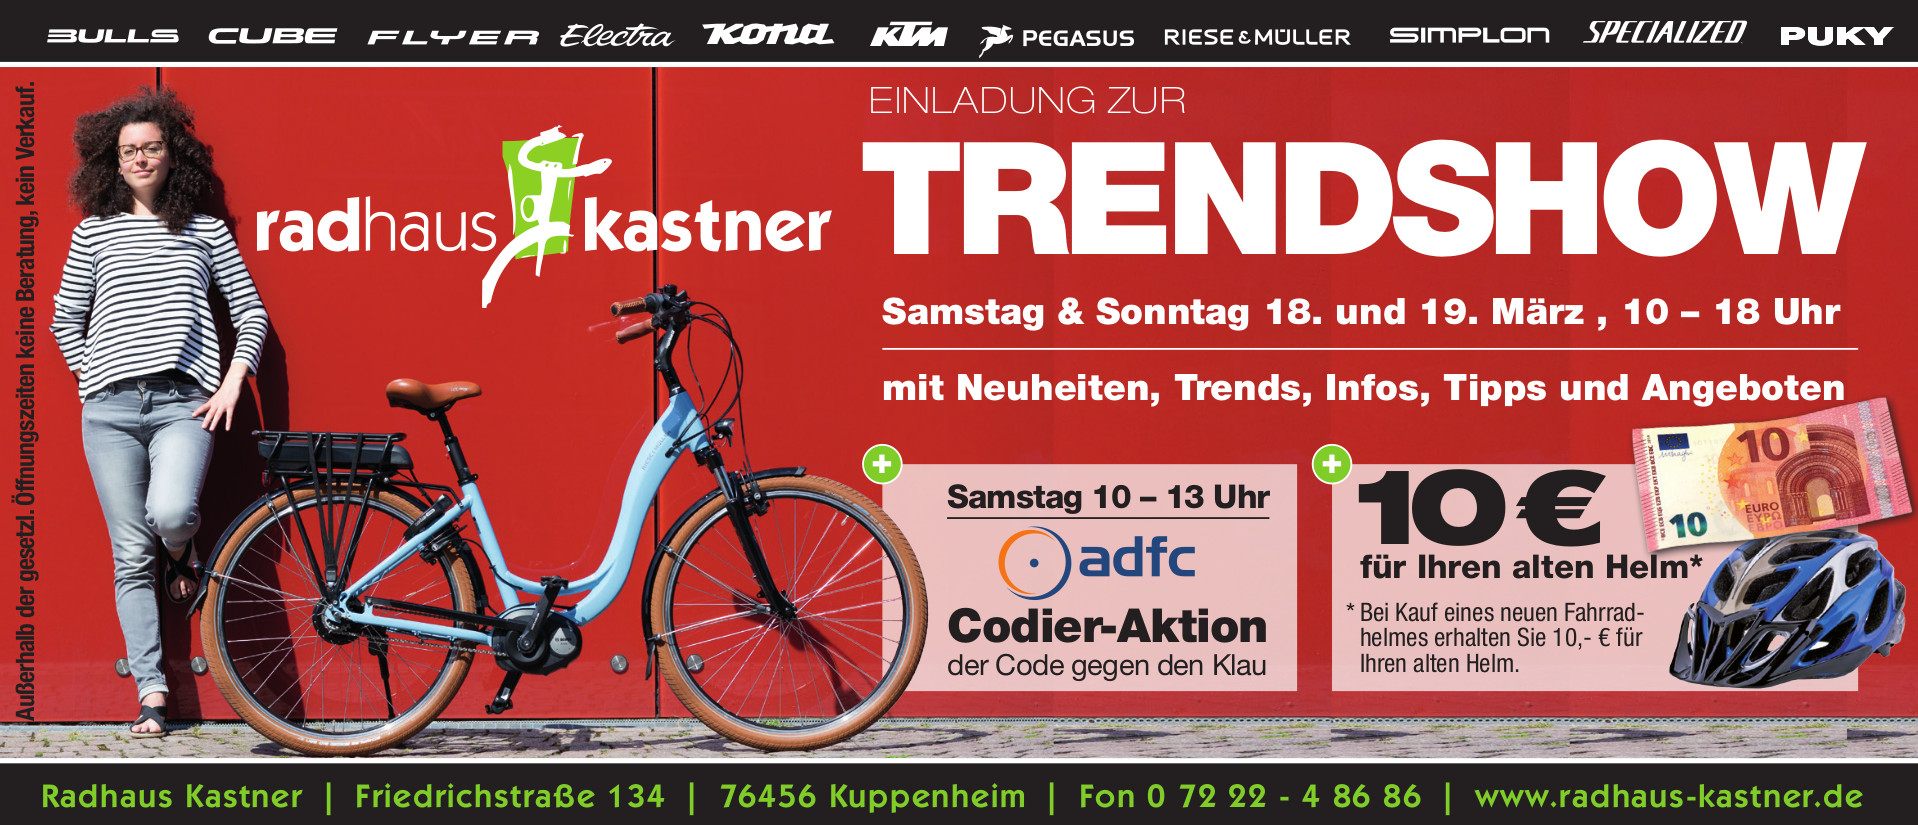 Radhaus Kastner Trendshow 2017